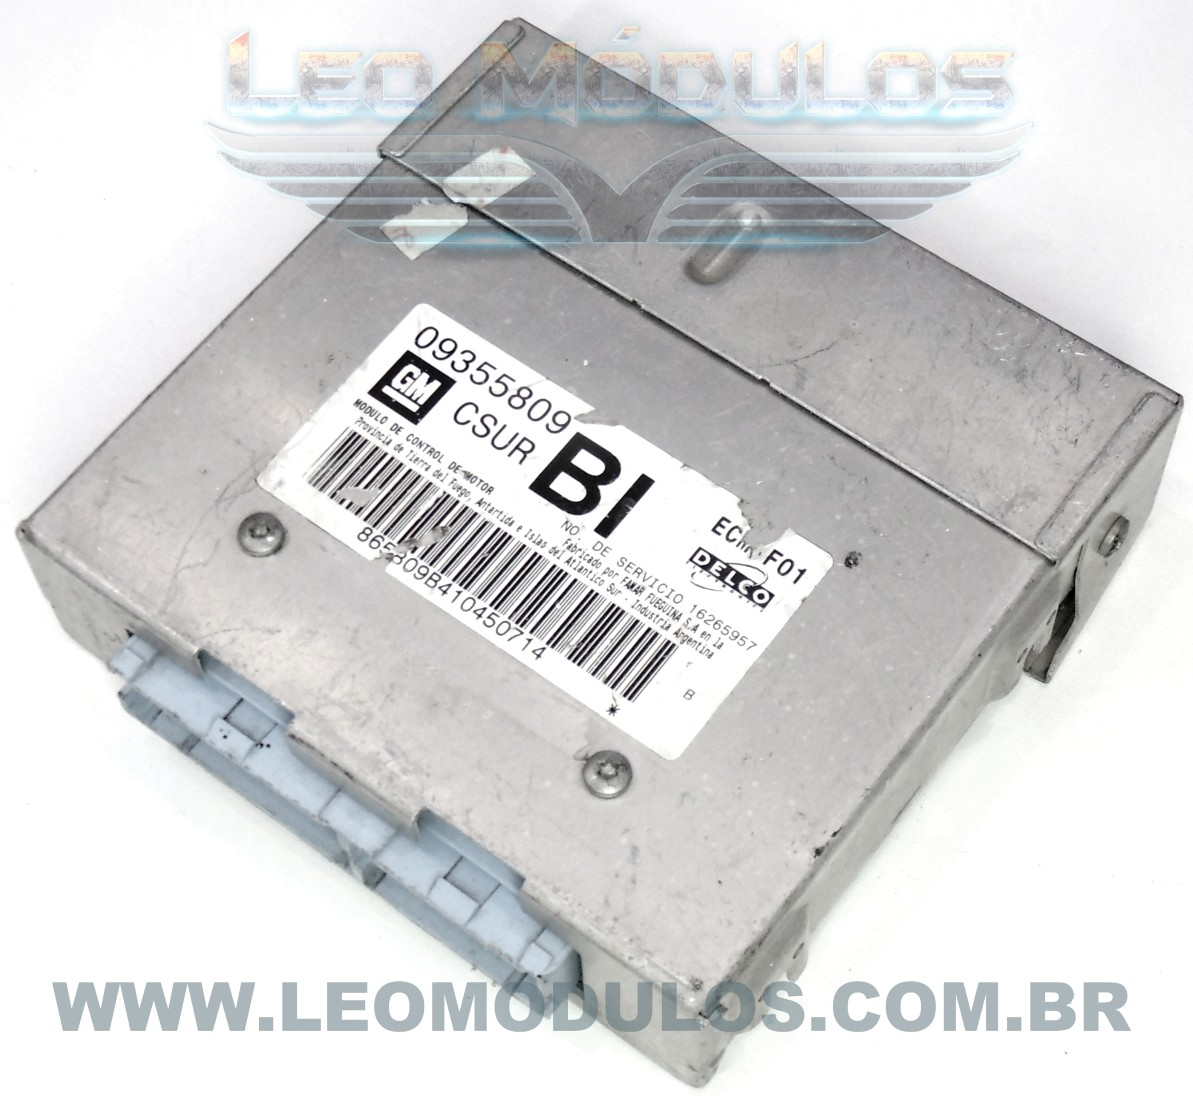 Módulo de injeção multec - CSUR BI 09355809 16265957 - Chevrolet Corsa MPFI 1.6 8V - CSUR BI - Leo Módulos